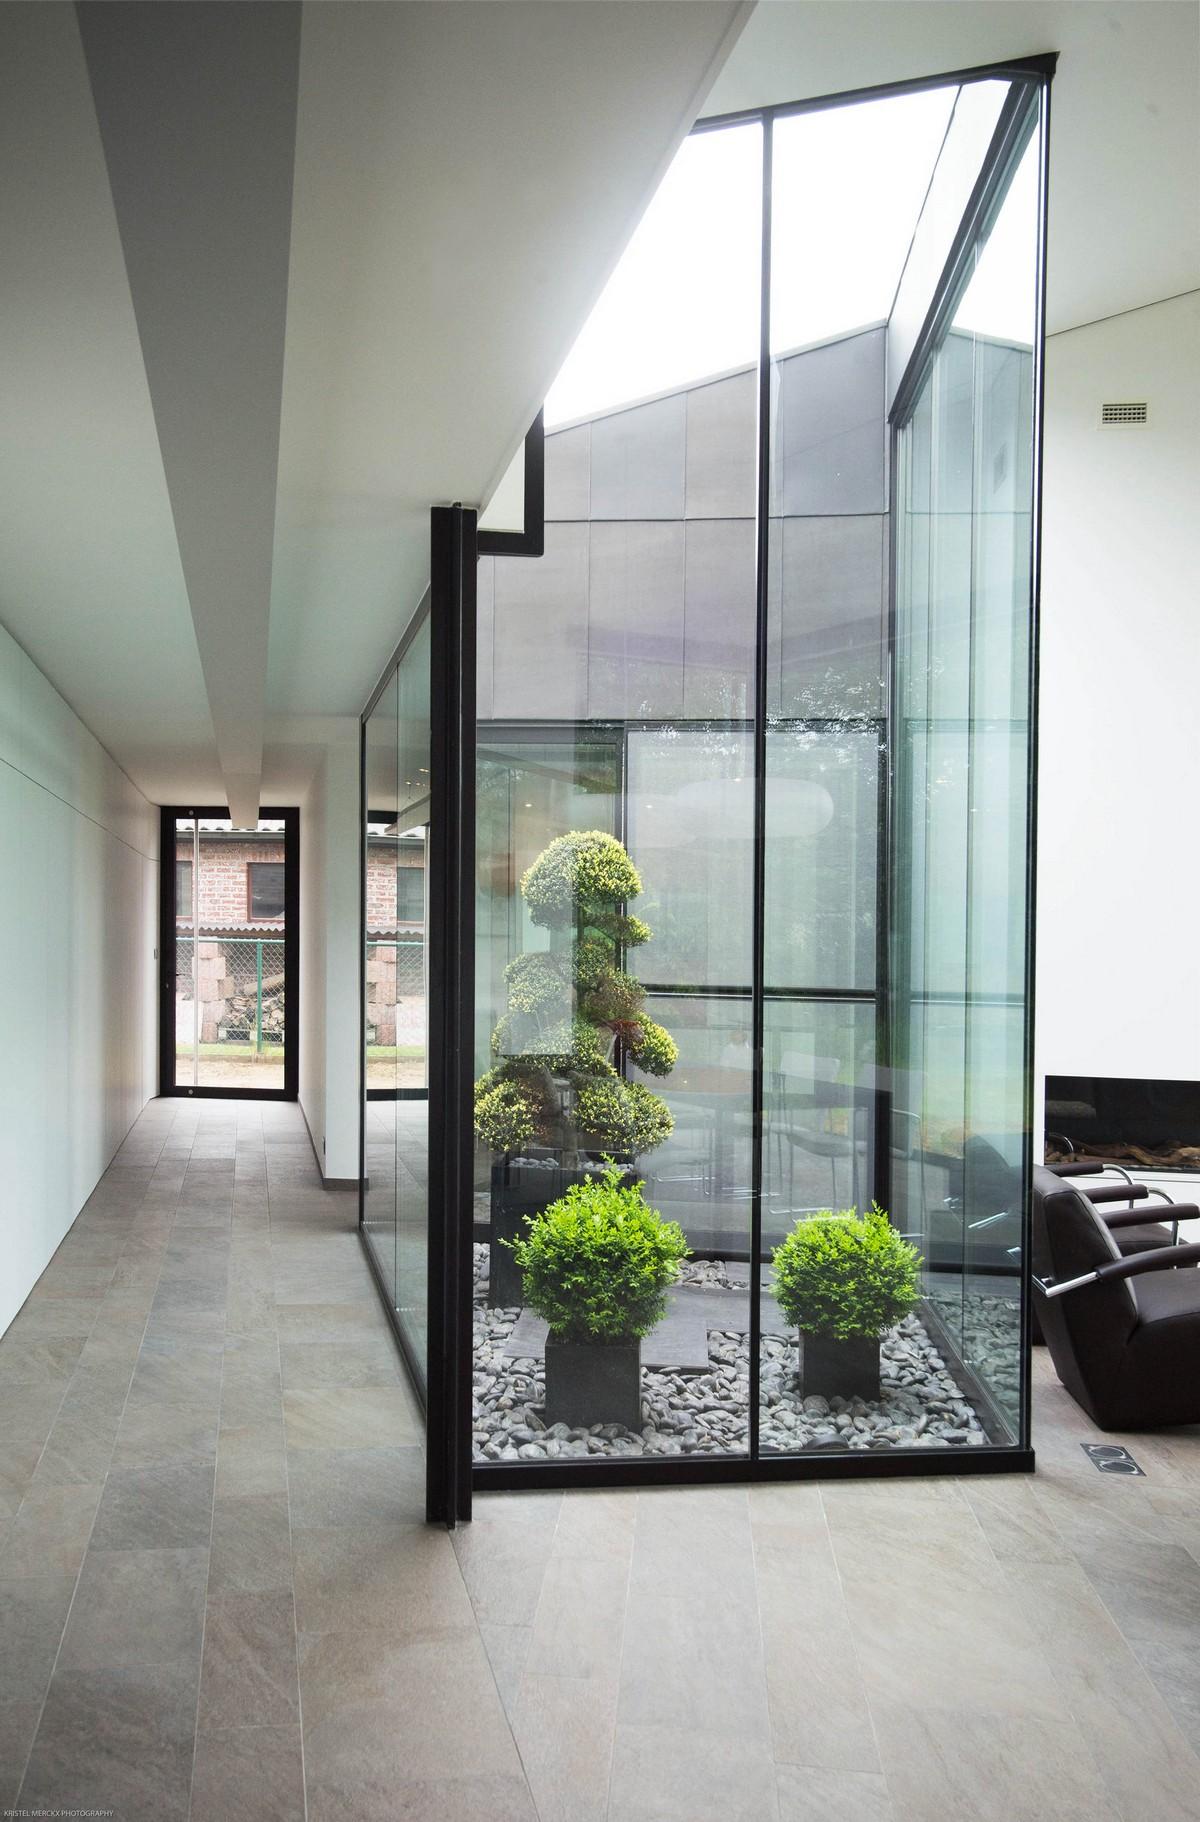 Enclosed garden courtyard ITCHBAN.com